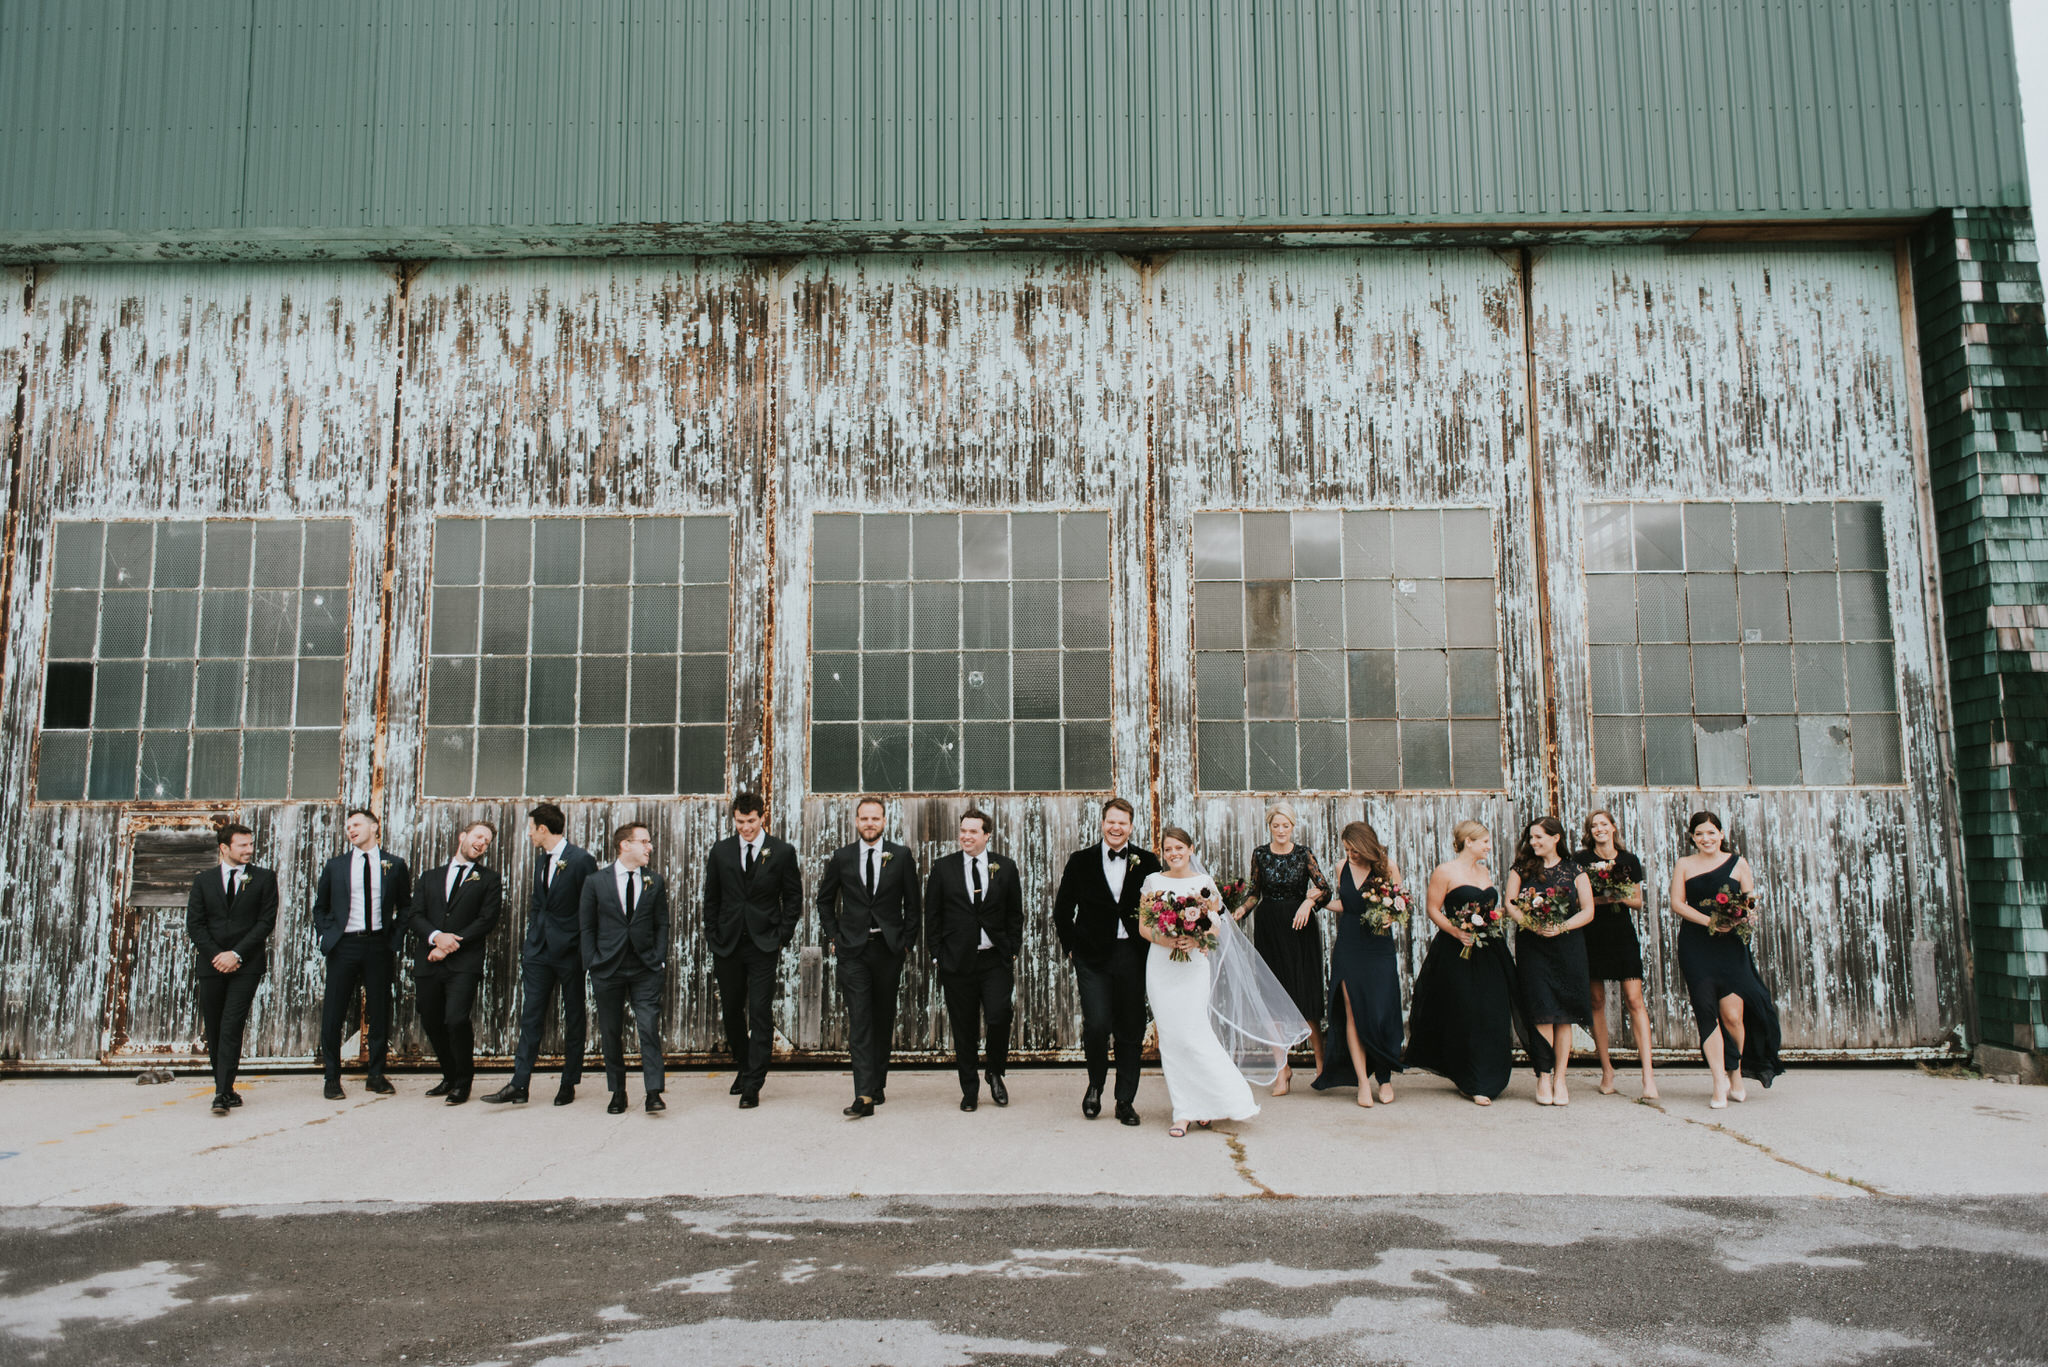 scarletoneillphotography_weddingphotography_prince edward county weddings053.JPG